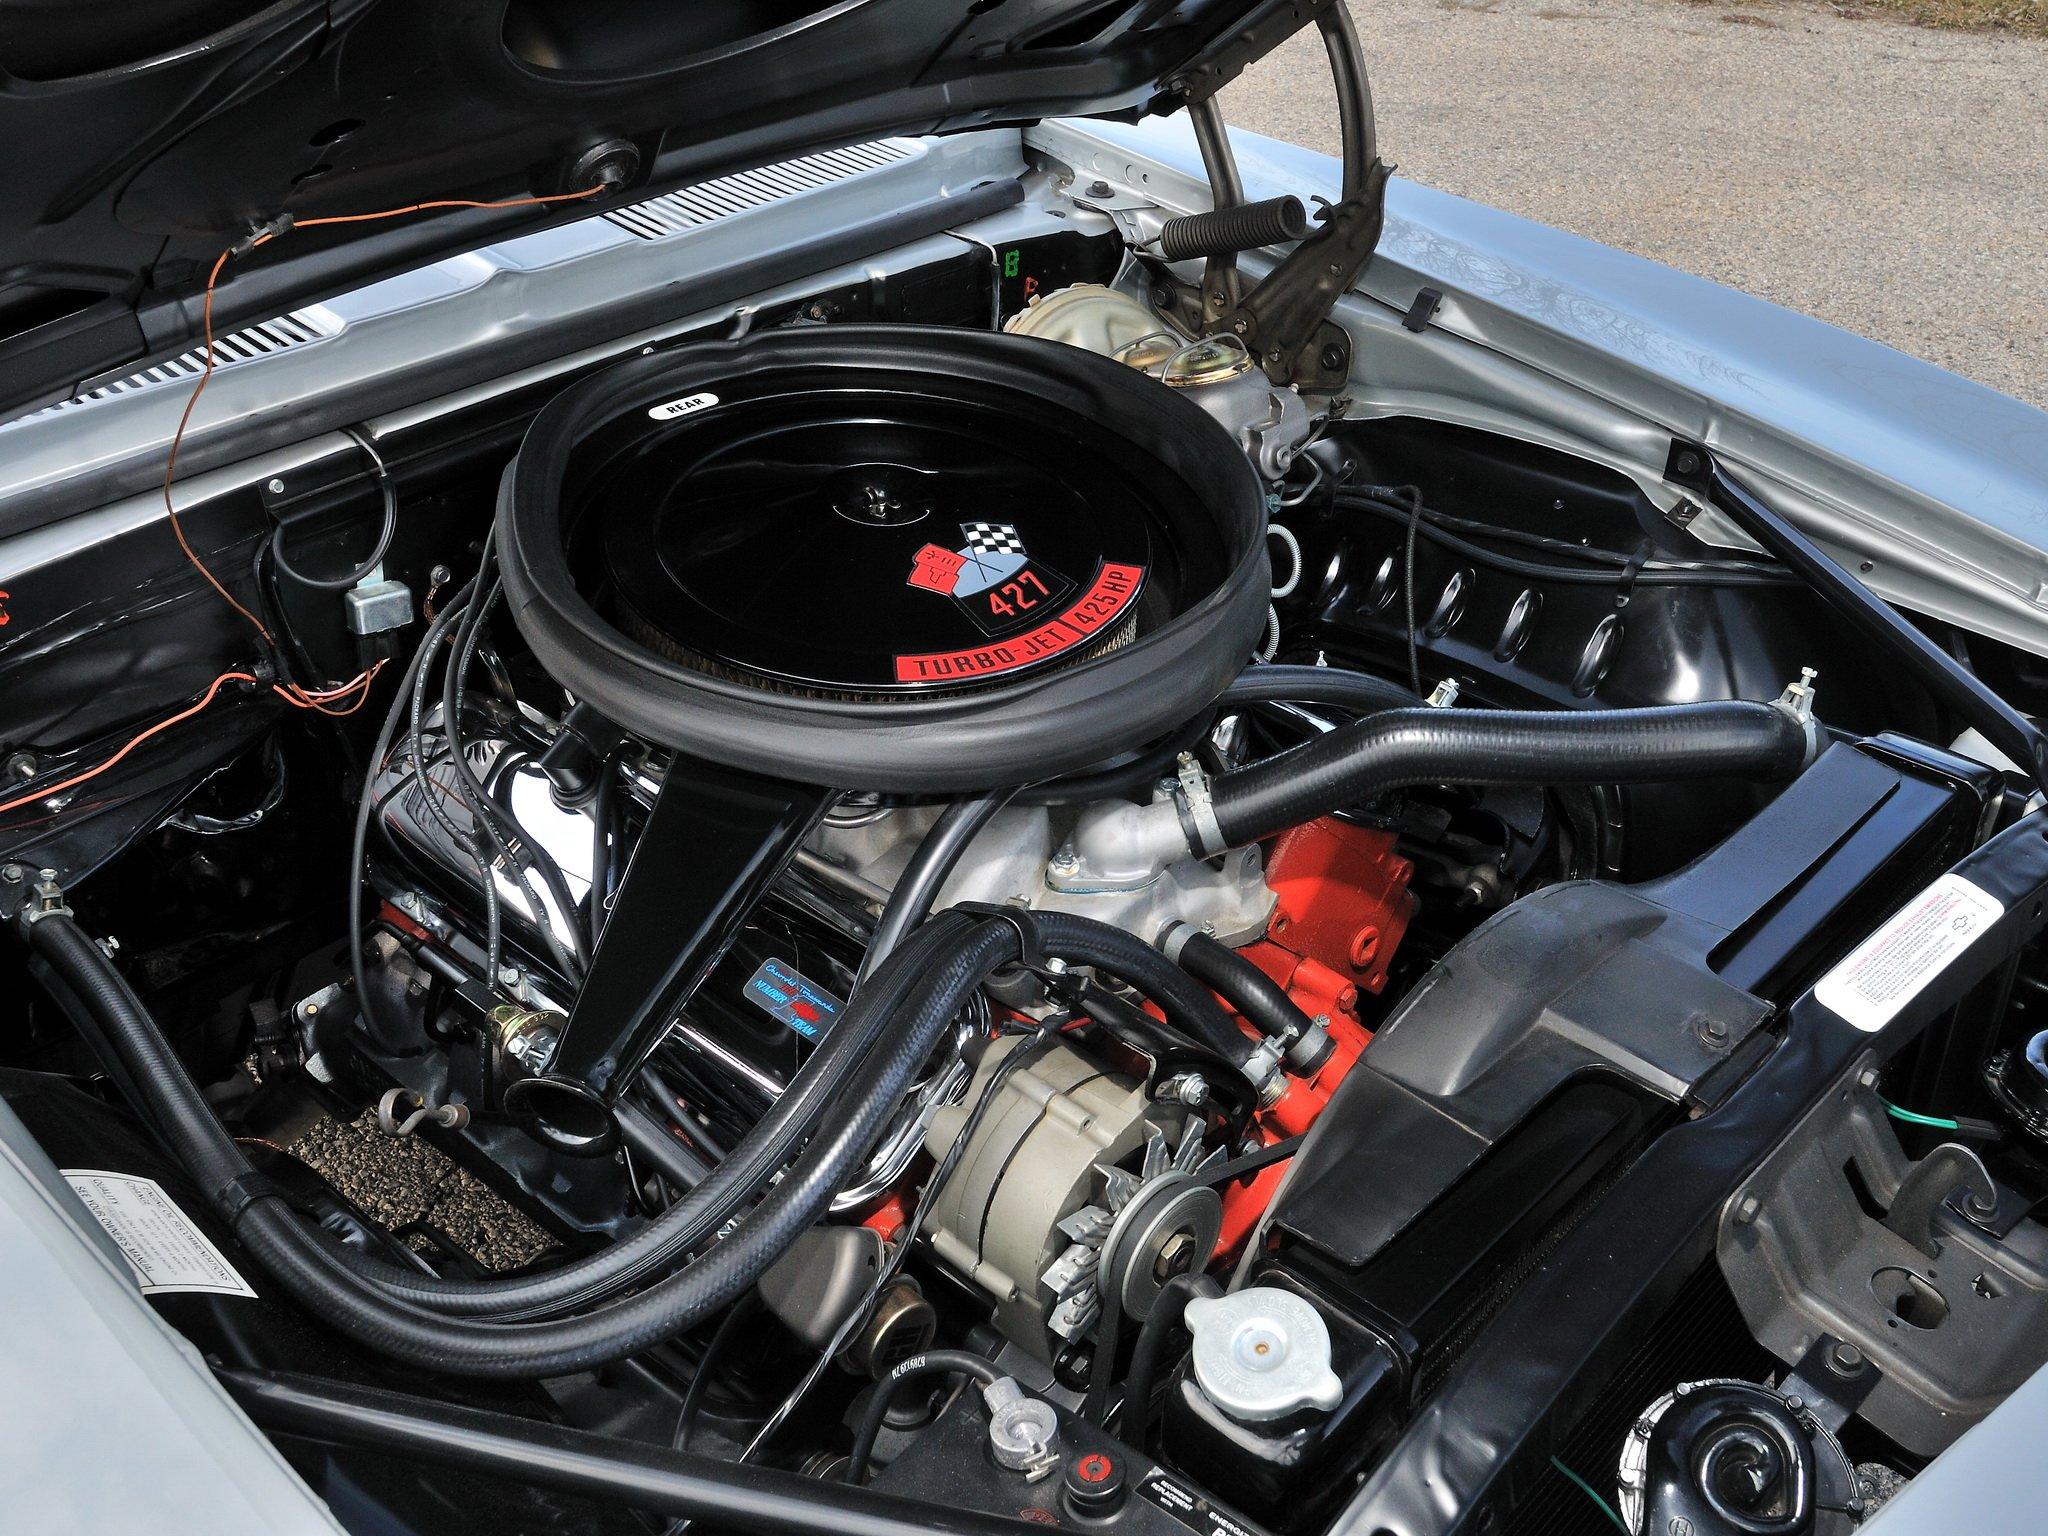 1969 Chevrolet Camaro L72 427 425hp Copo Muscle Classic